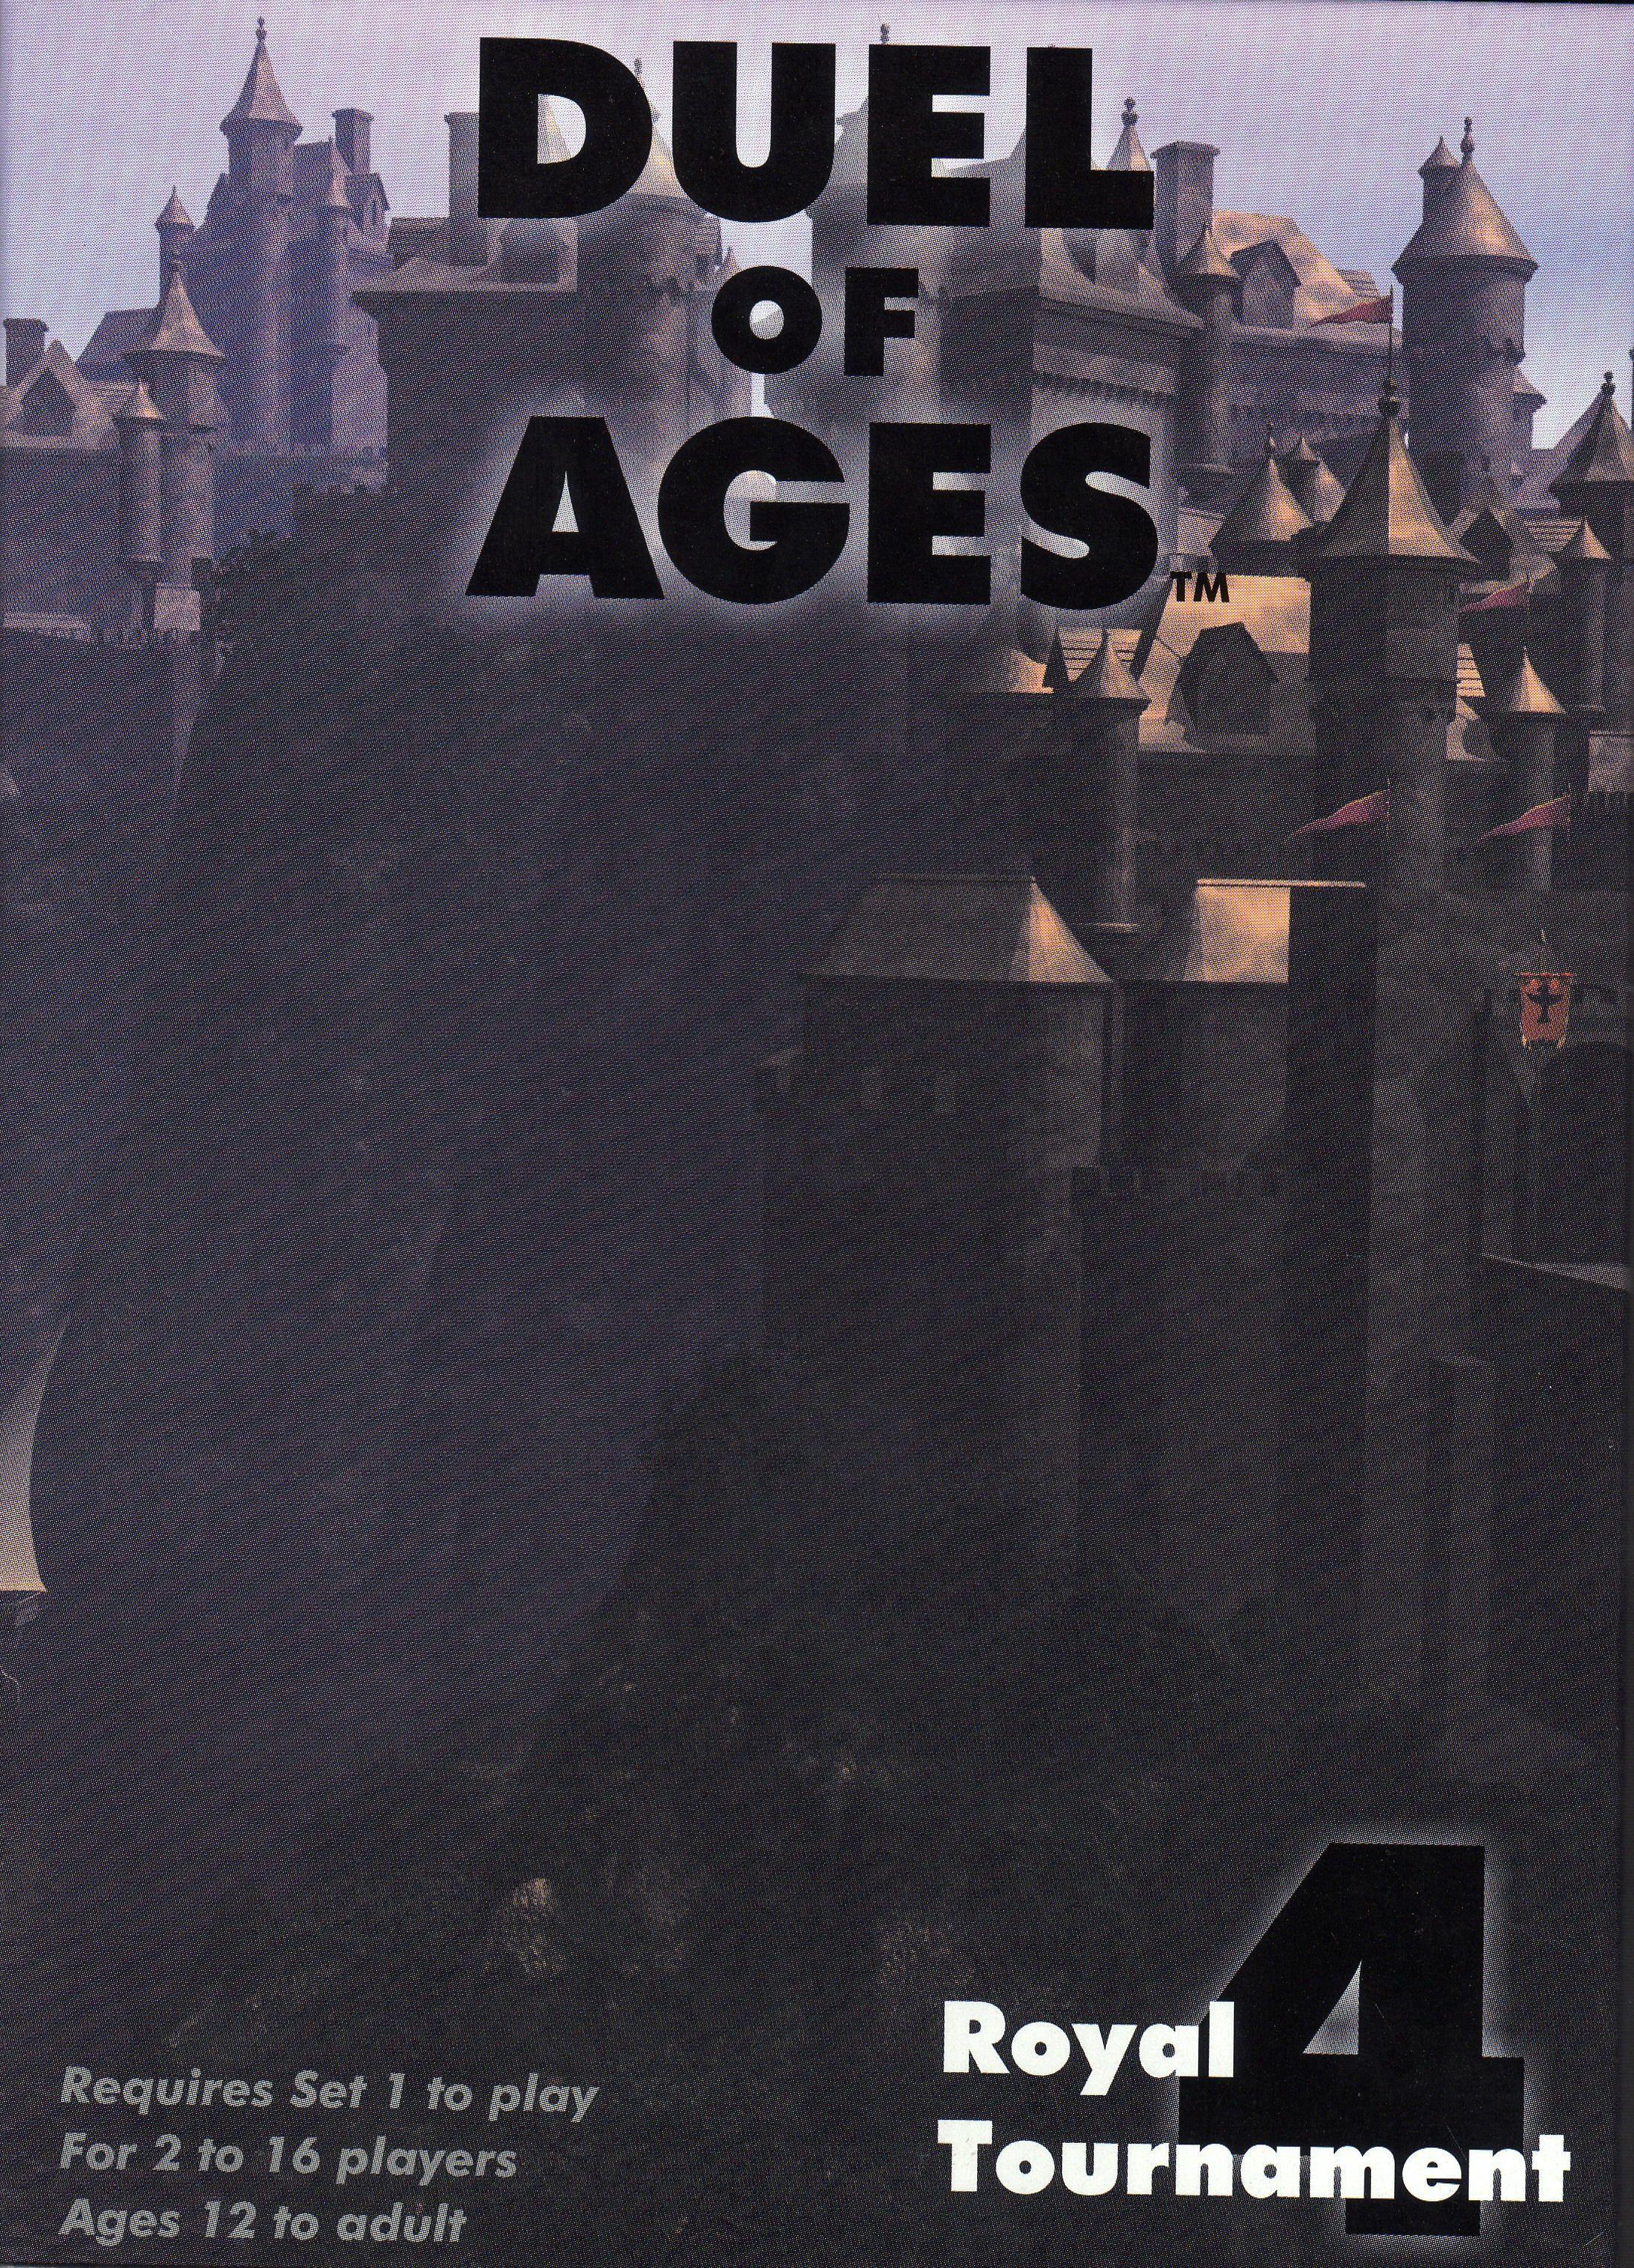 Duel of Ages Set 4: Royal Tournament